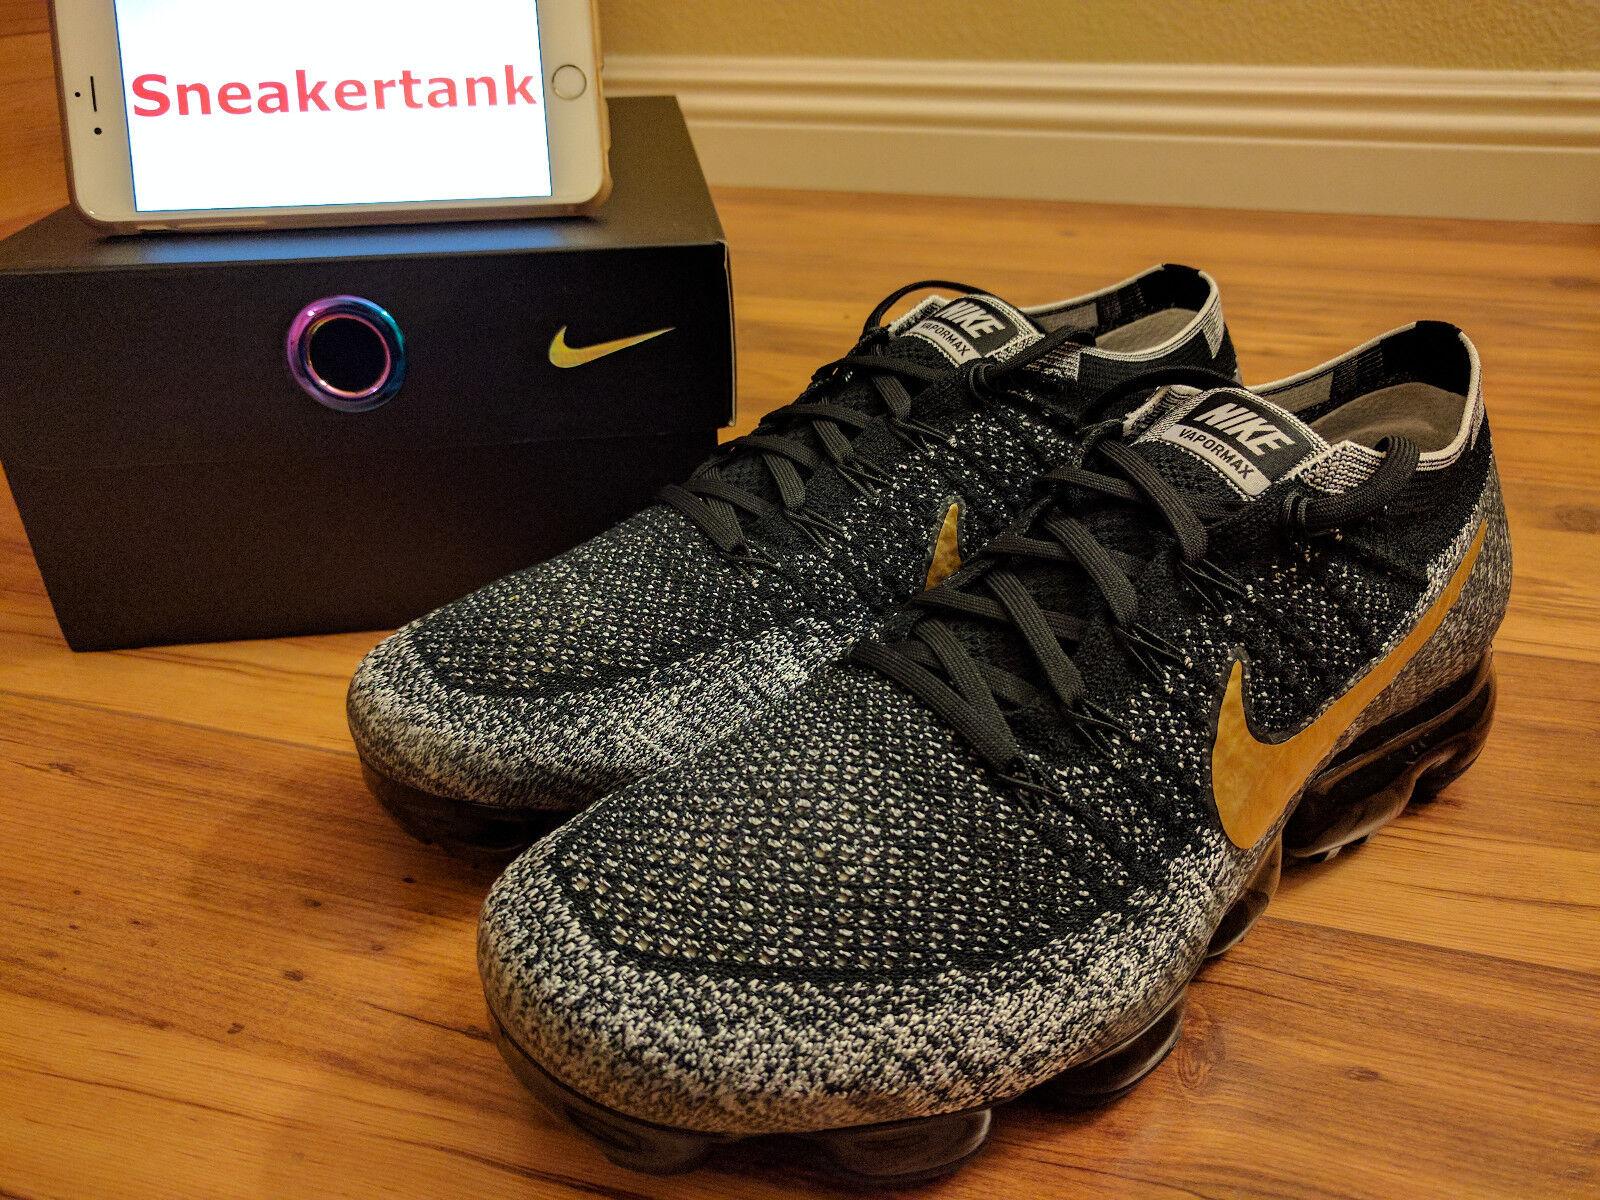 DS Nike Vapormax Flyknit iD Black White gold Oreo Sz 10.5 Men nikelab 941834-993